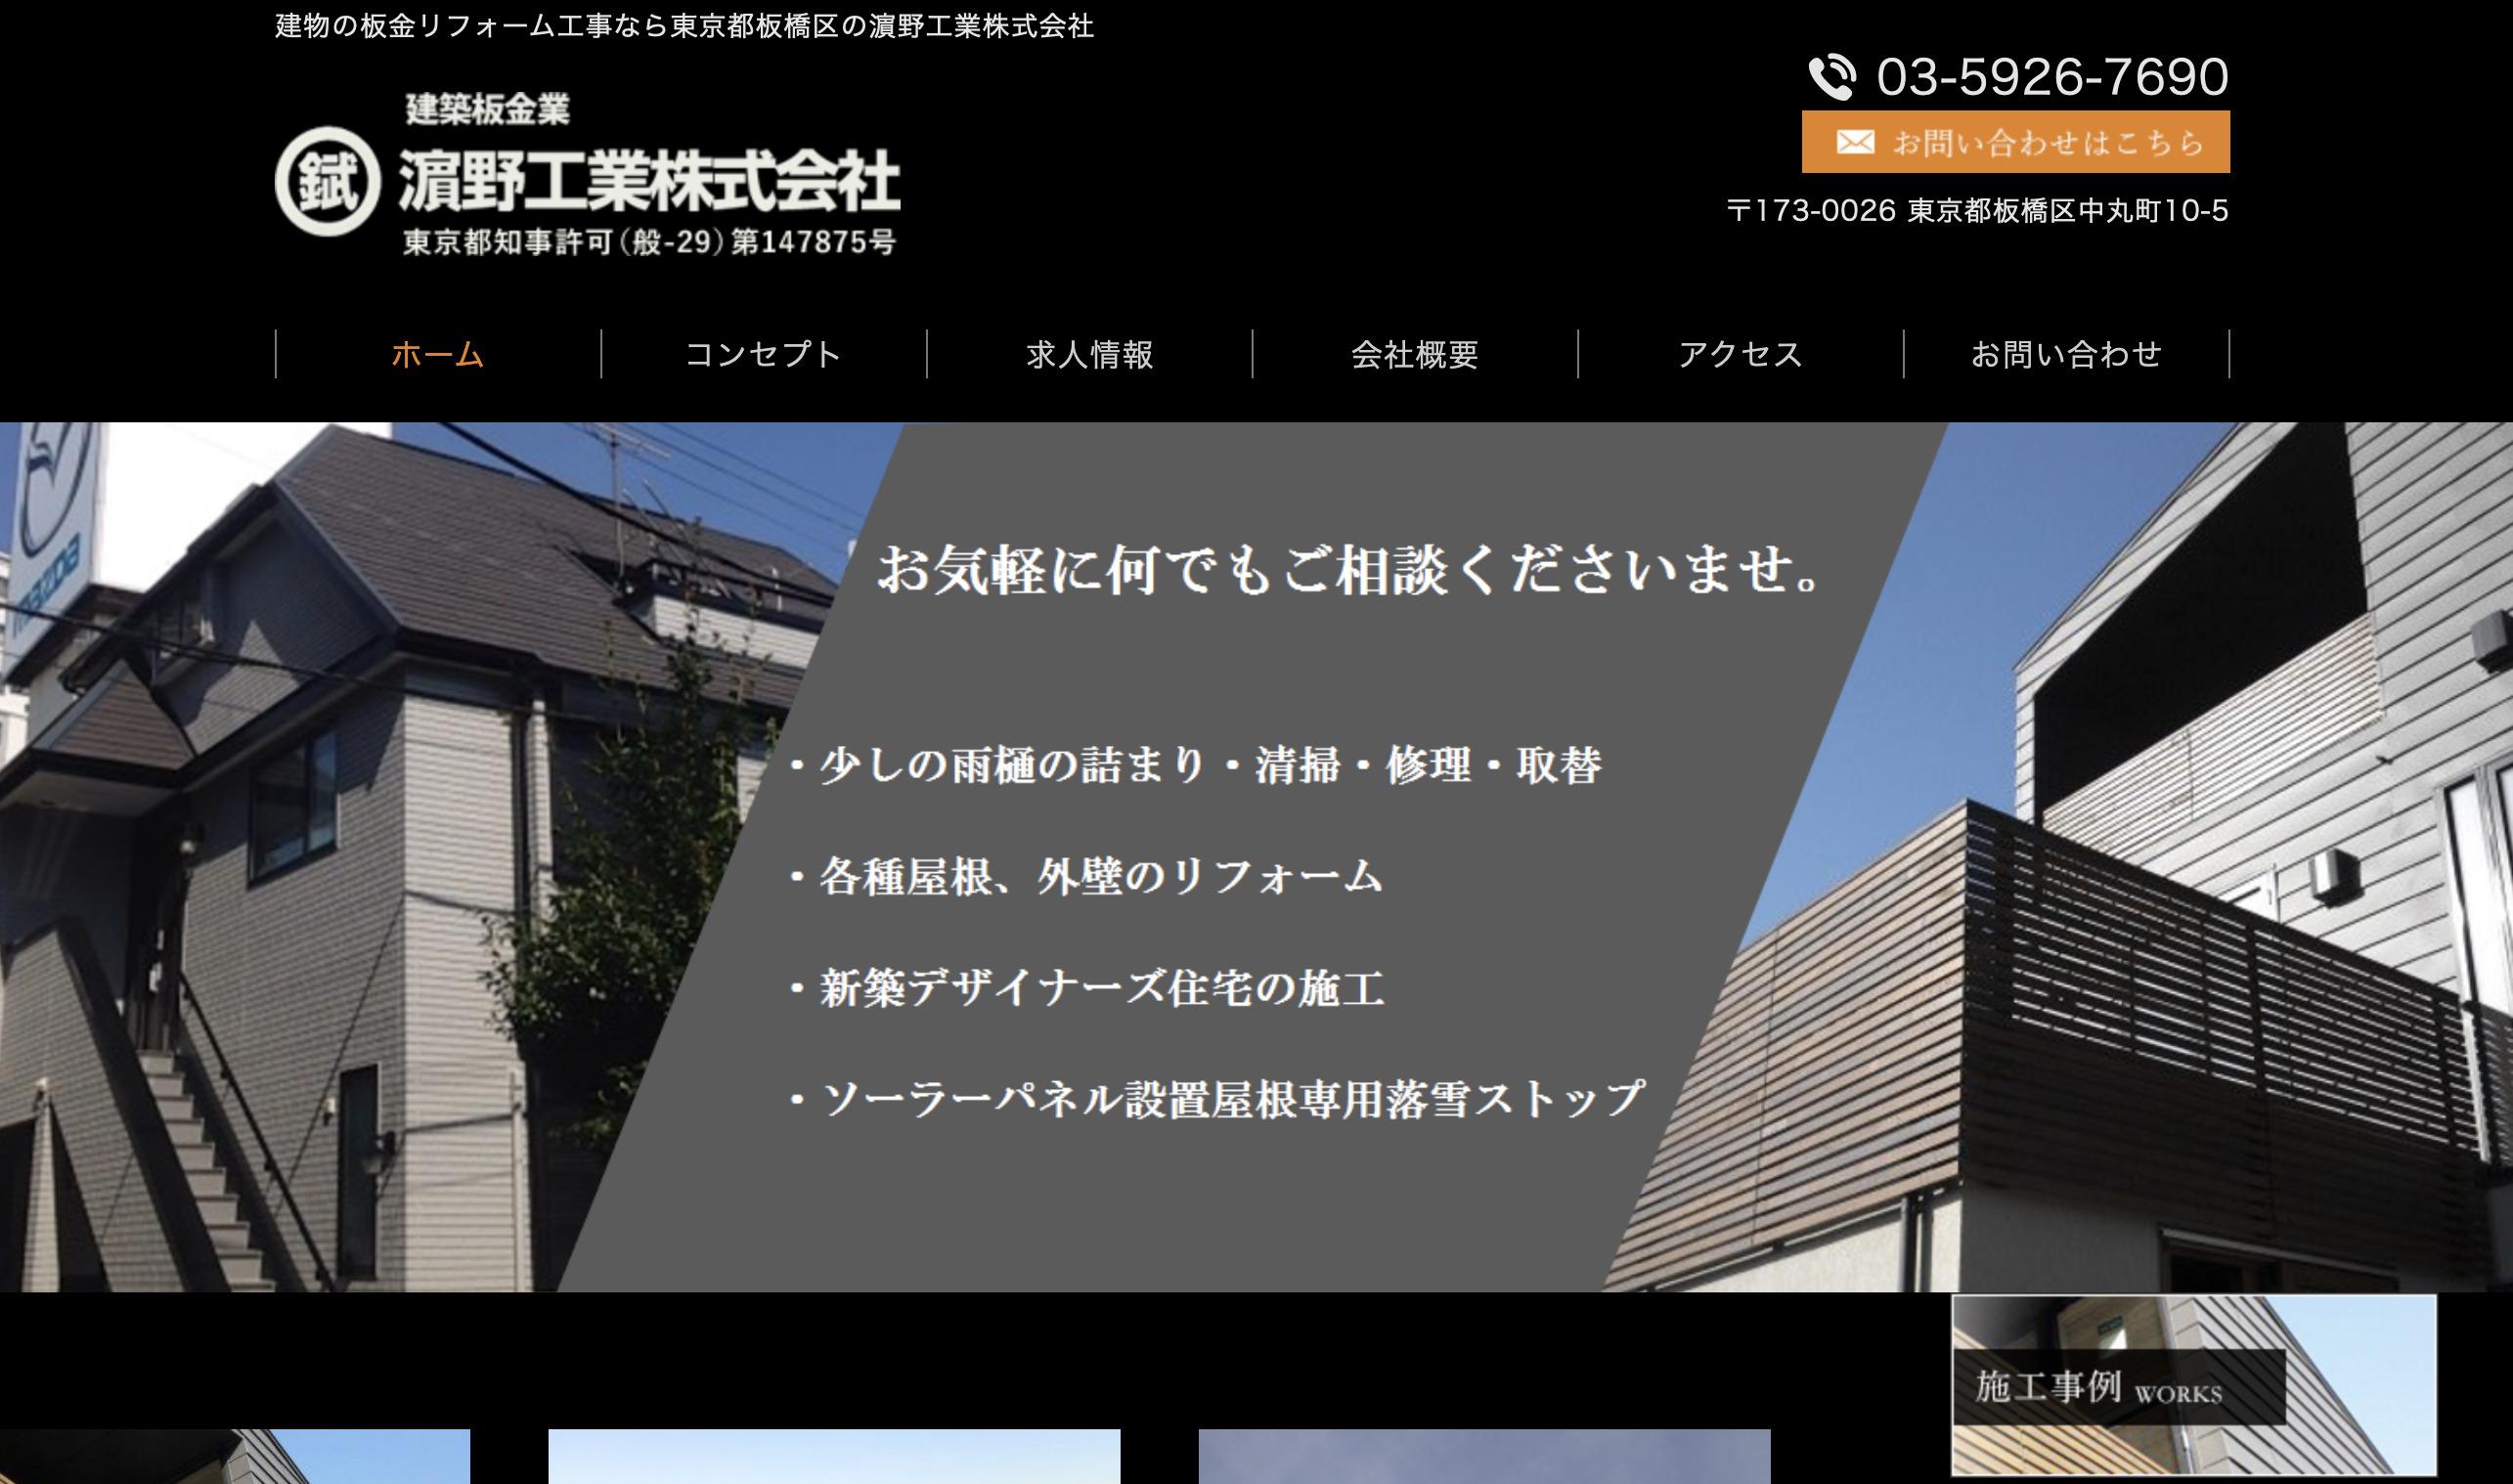 クール編:濱野工業株式会社